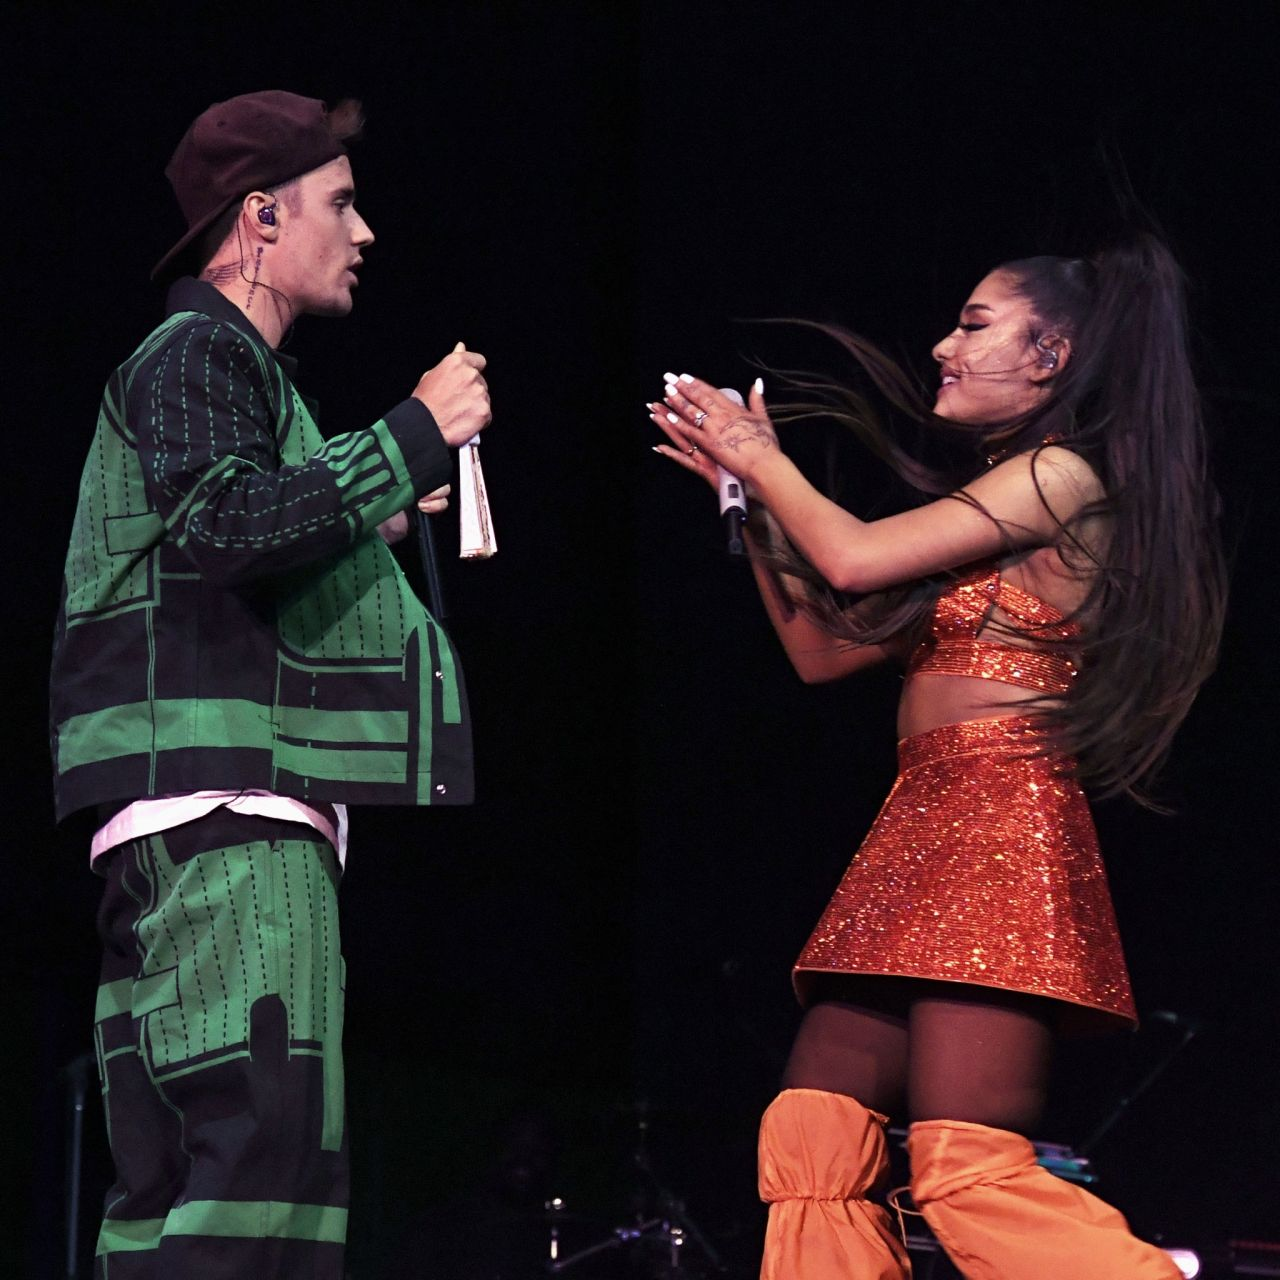 Ariana Grande Performing At Coachella 04 21 2019